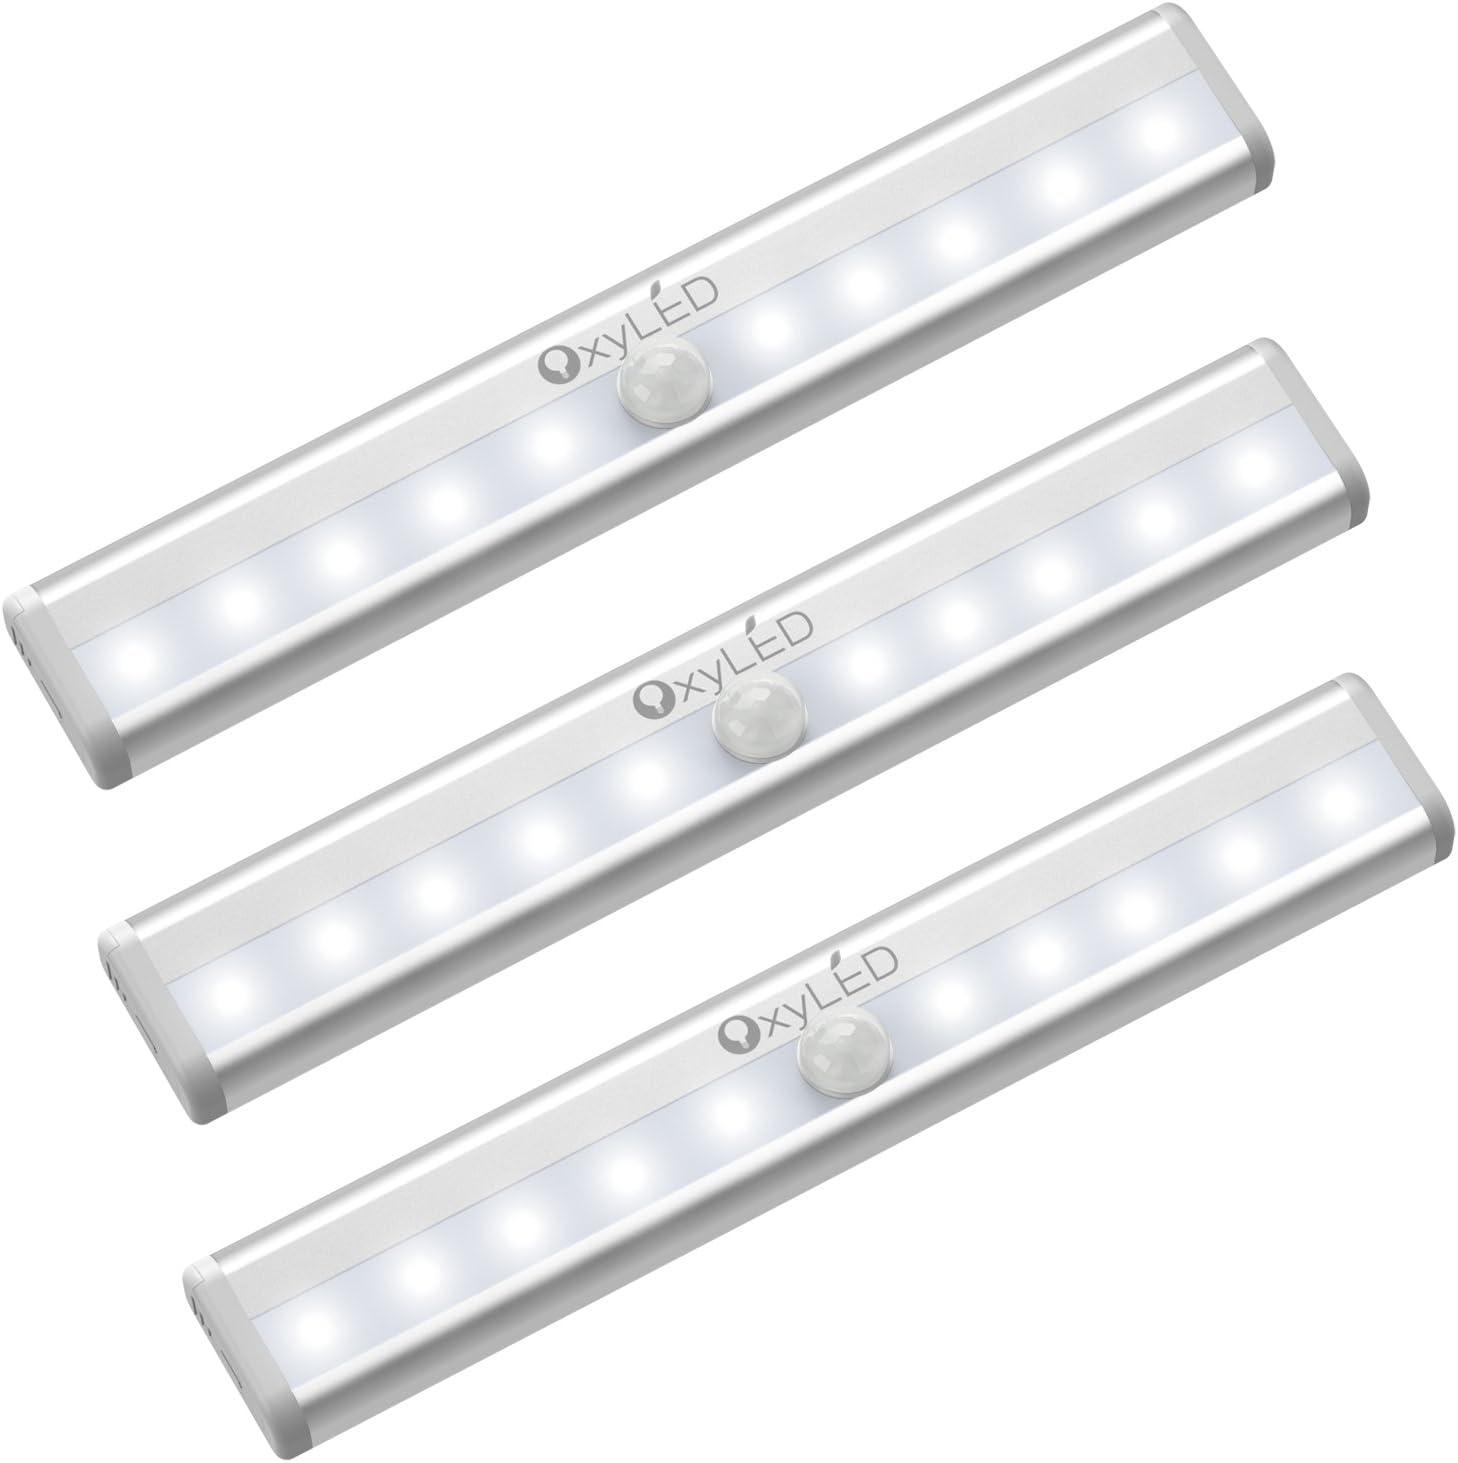 under counter light fixtures amazon com lighting ceiling fans rh amazon com